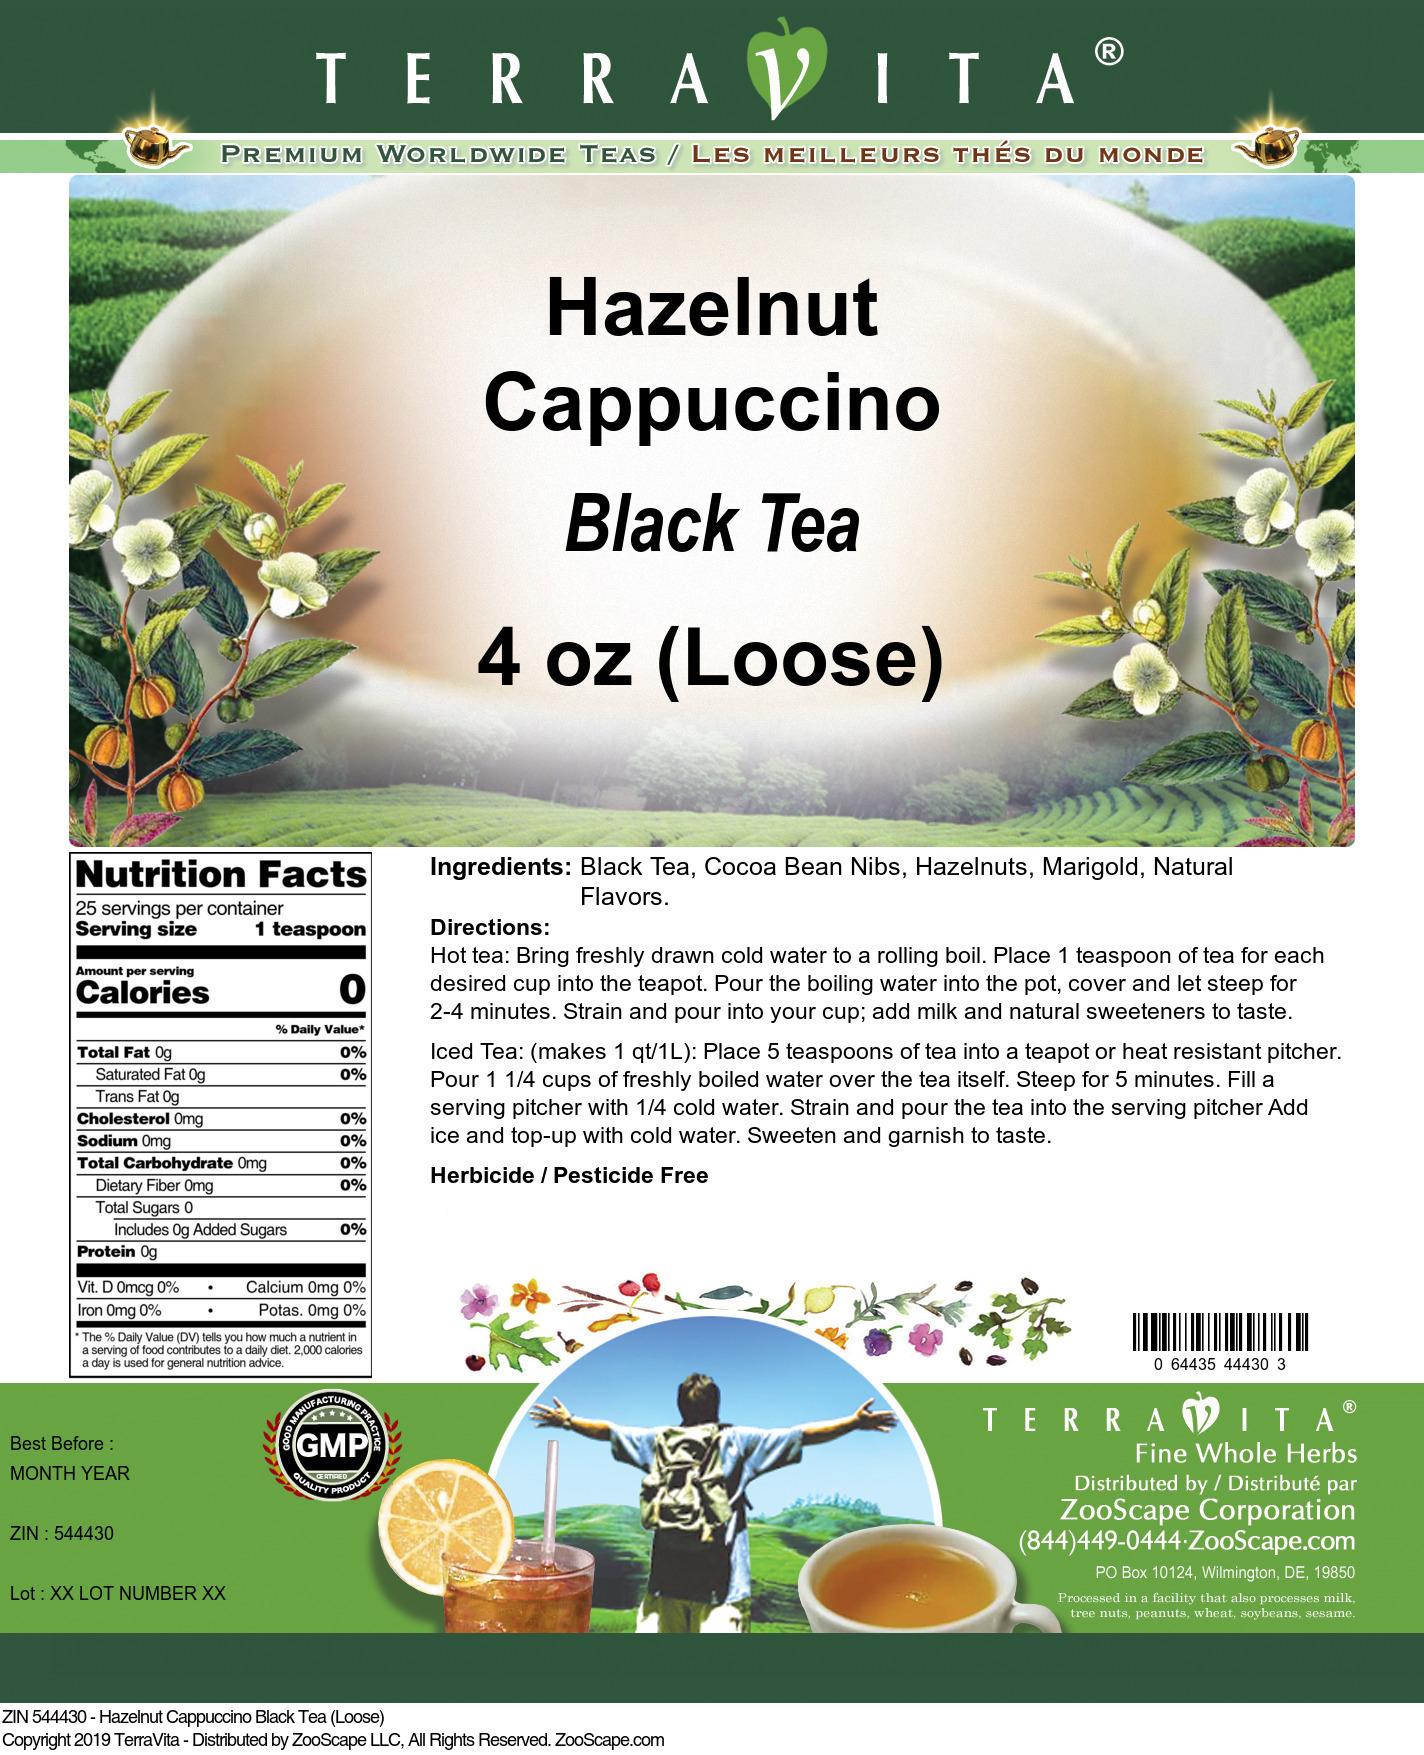 Hazelnut Cappuccino Black Tea